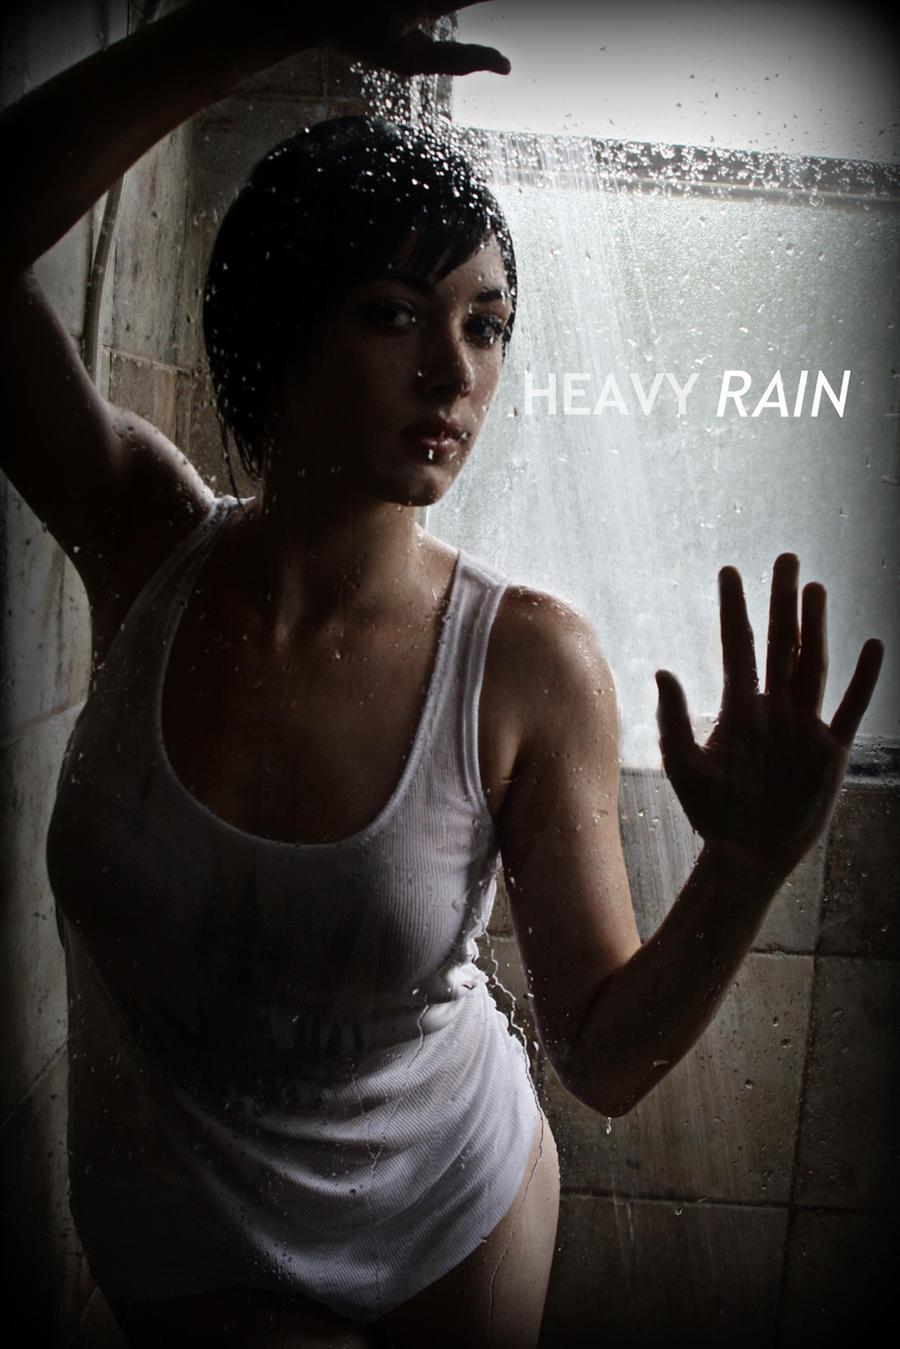 Madison paige heavy rain shower